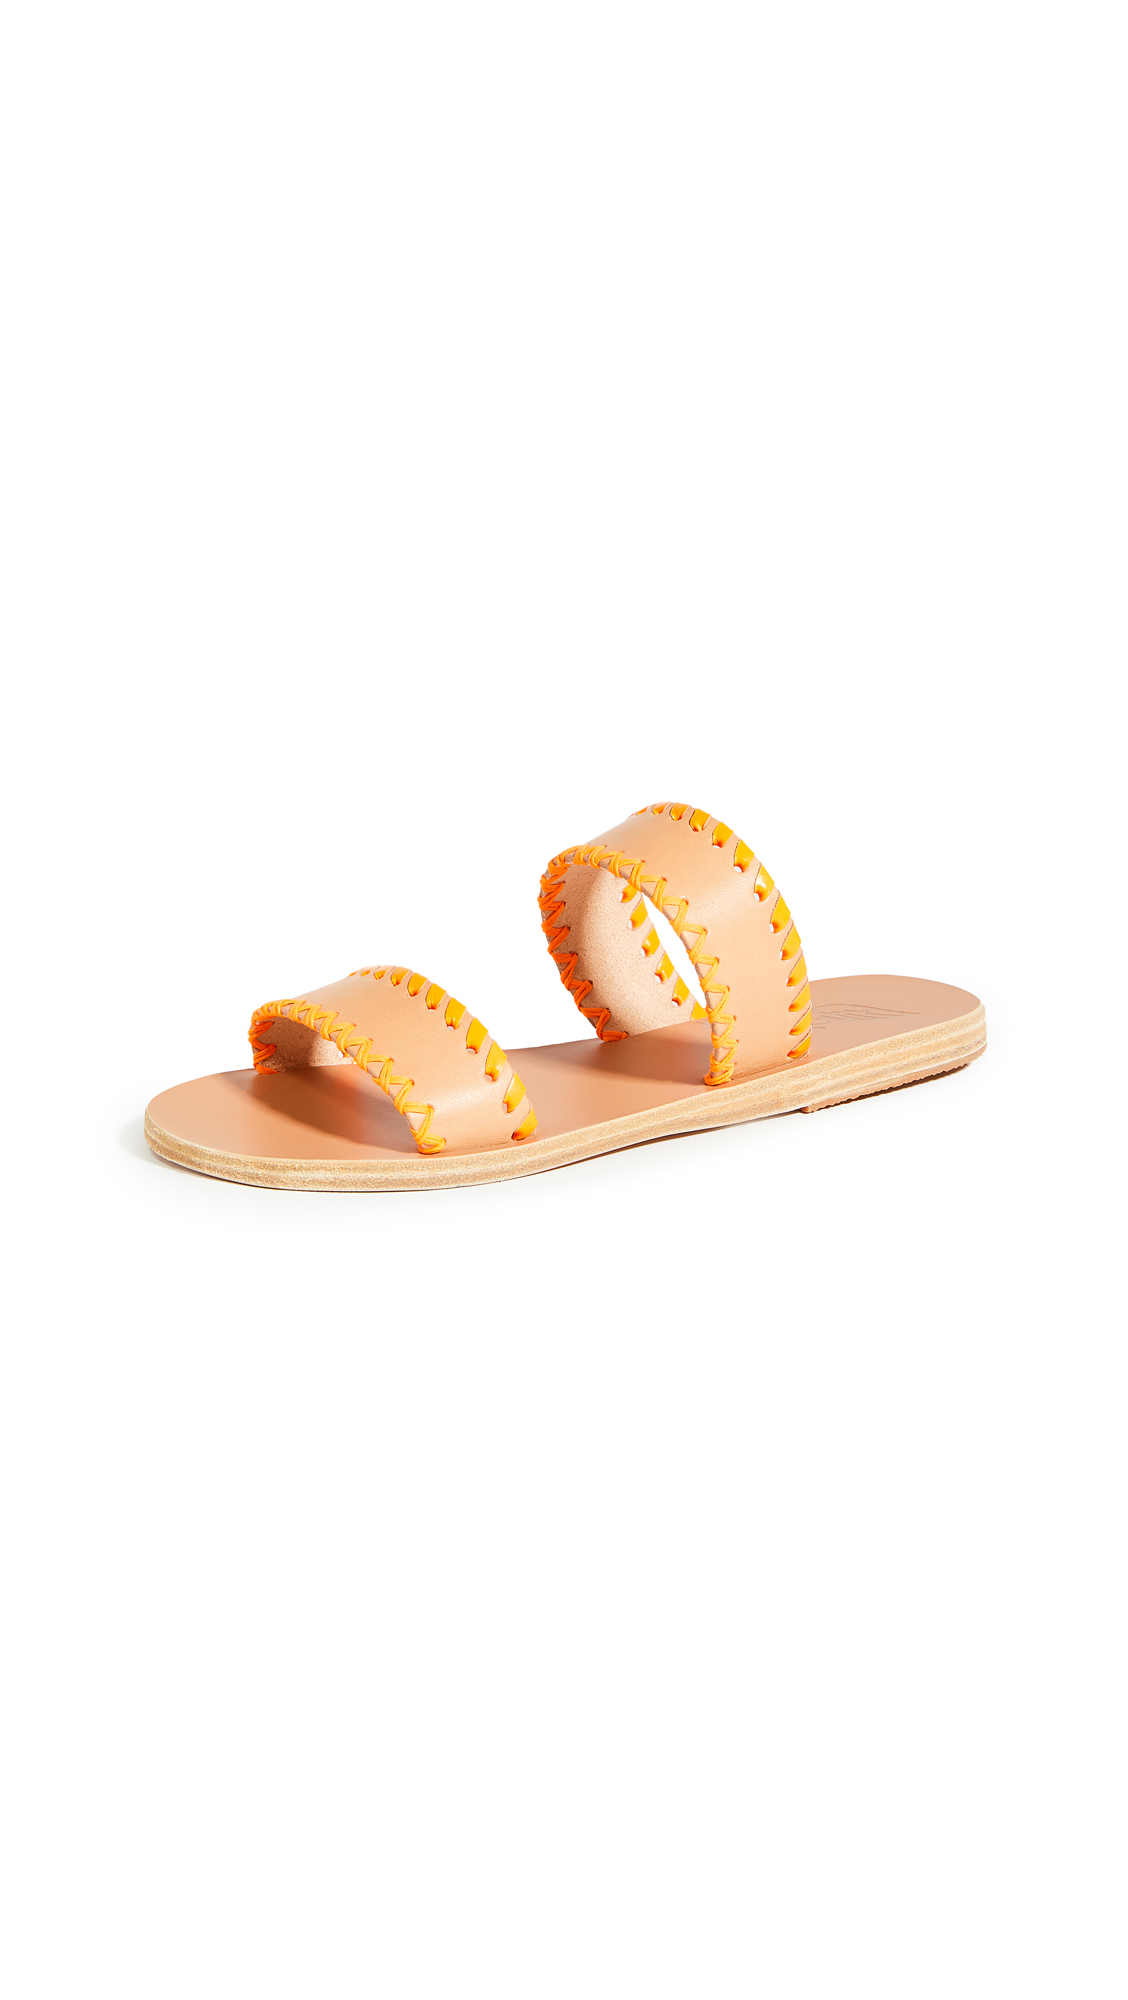 Buy Ancient Greek Sandals Melia Stitch Slides online, shop Ancient Greek Sandals